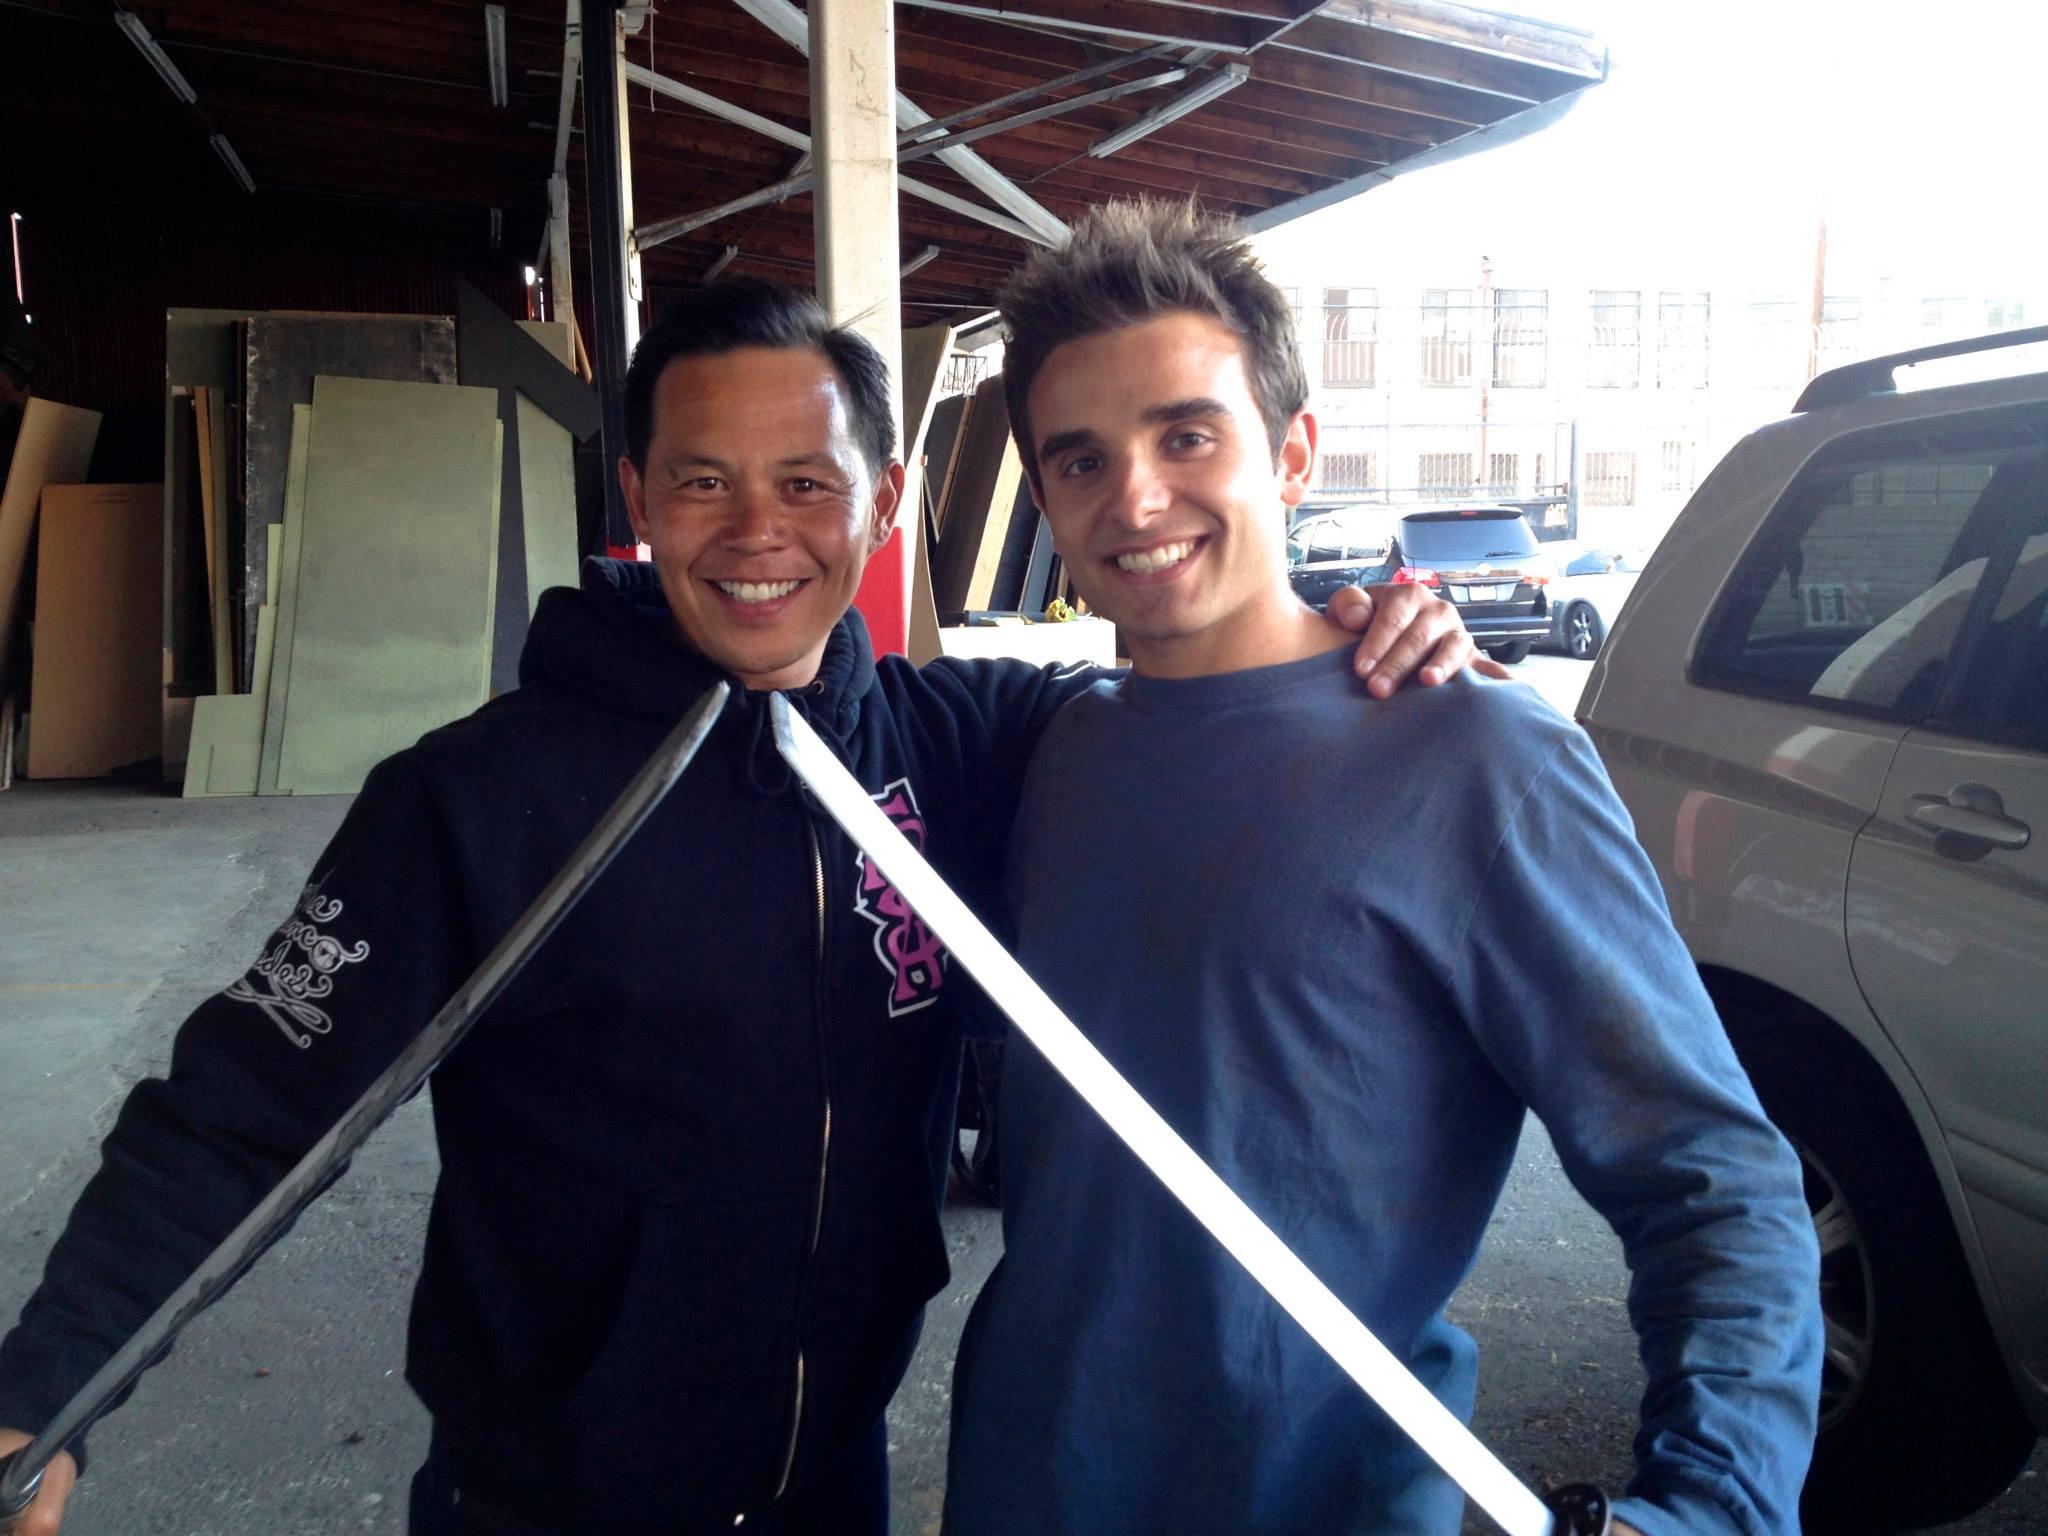 With Ernie Reyes Jr. on Ninja Apocalypse